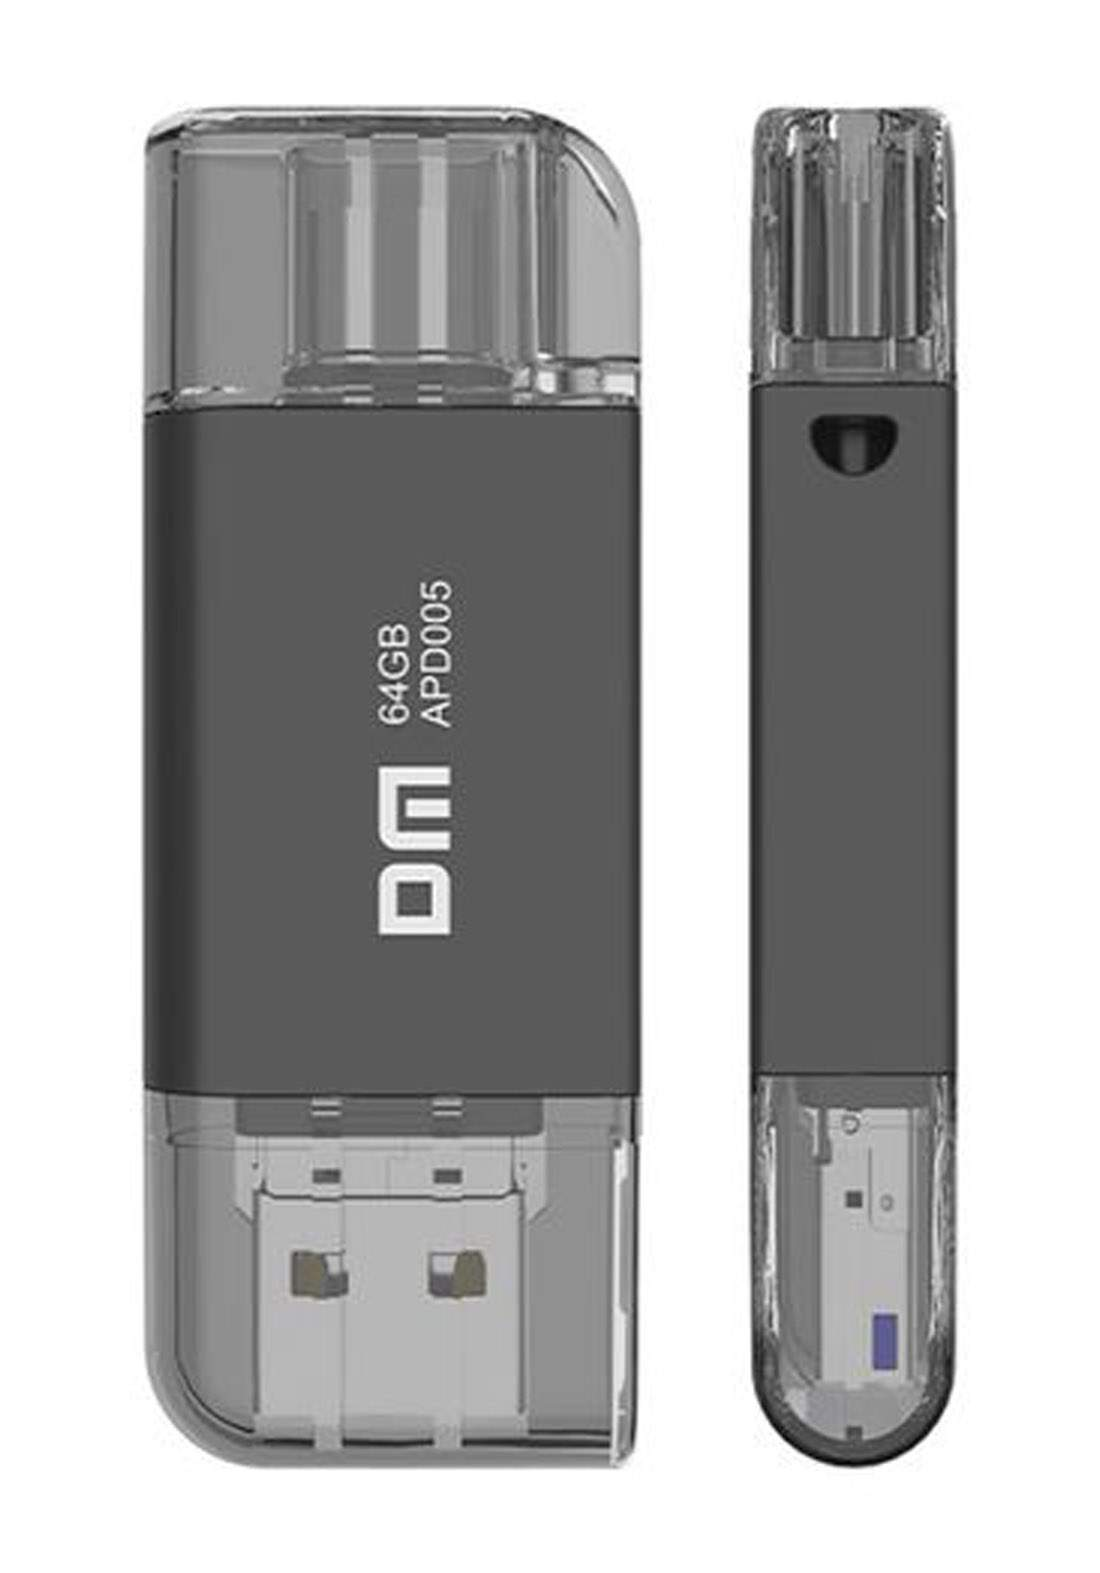 DM APD005 64GB Flash Memory - Black فلاش